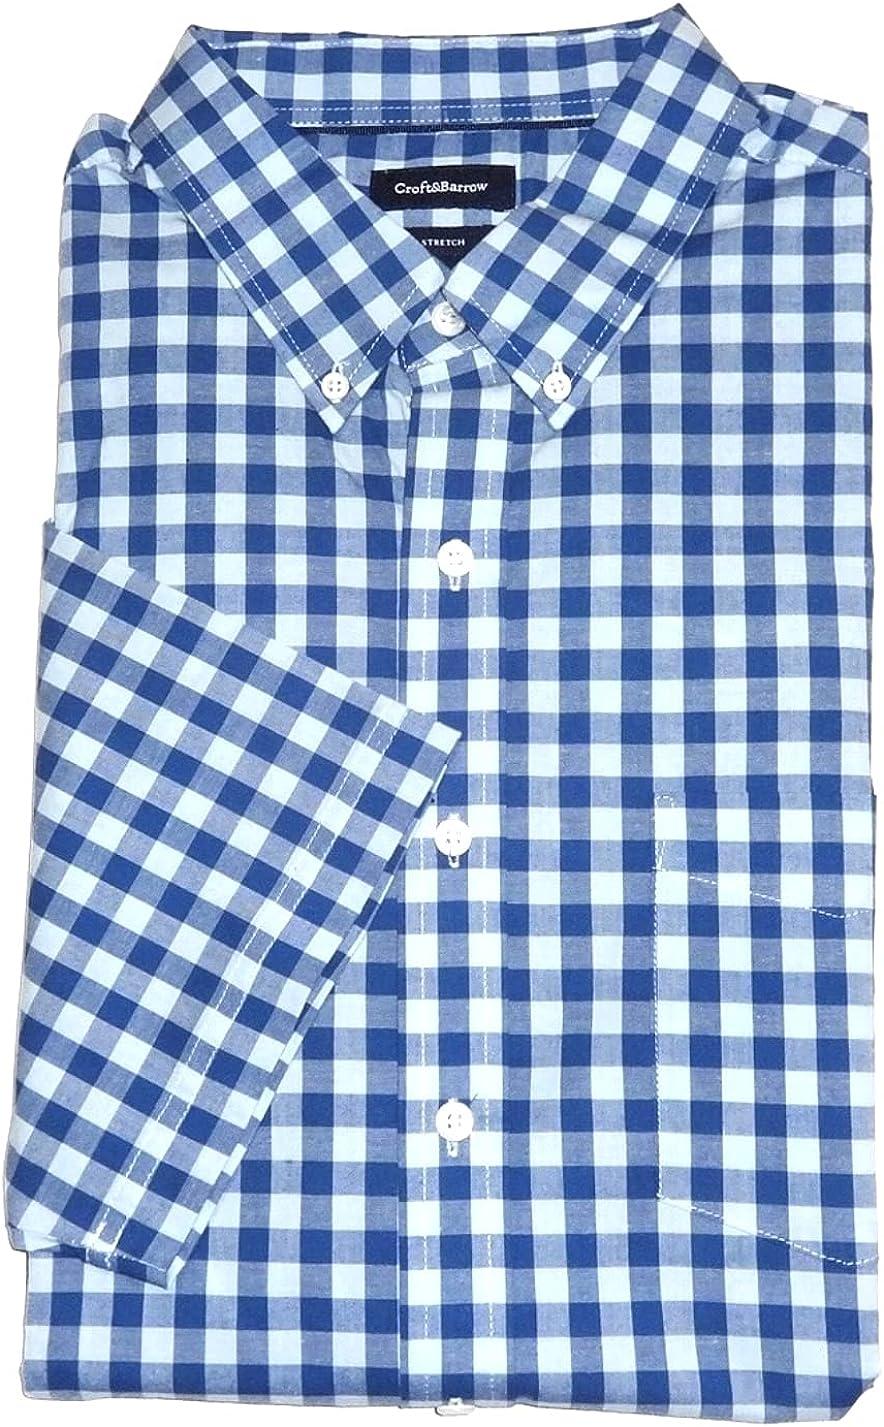 Croft & Barrow Mens Big Tall Classic Fit Short Sleeve Stretch Shirt Blue Check